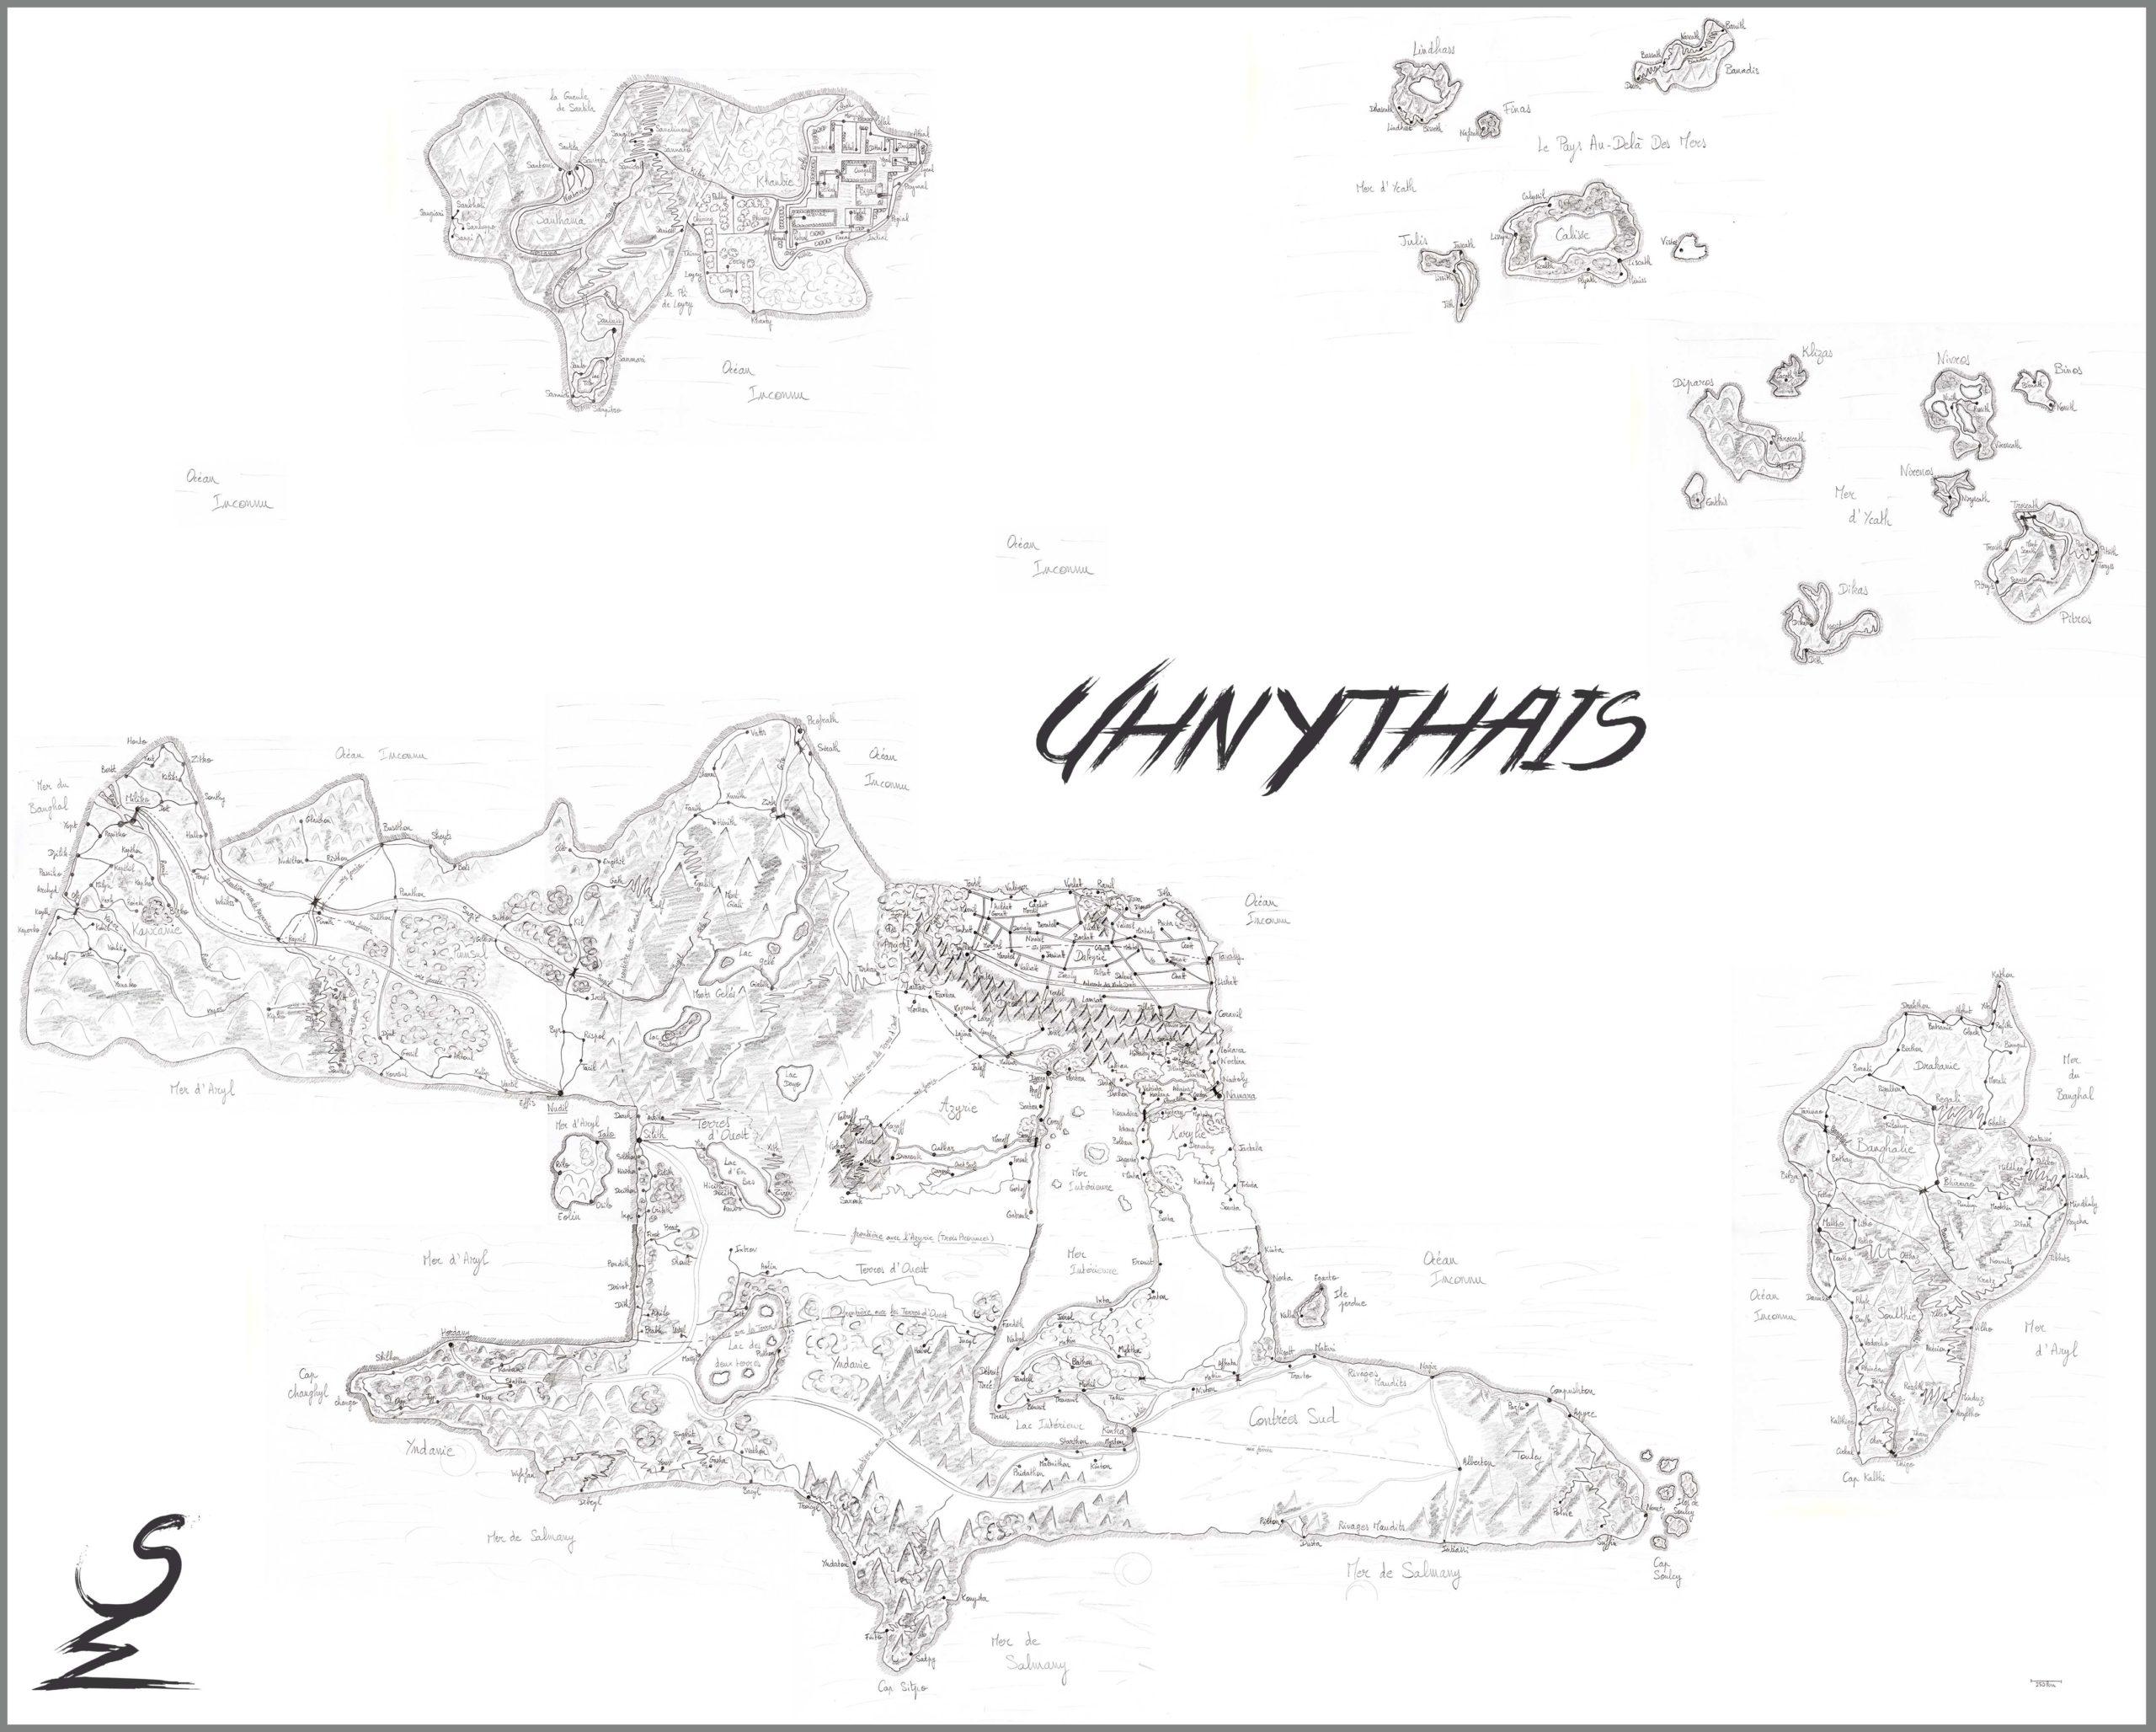 Plan Uhnythais, copyright Sandrine WALBEYSS